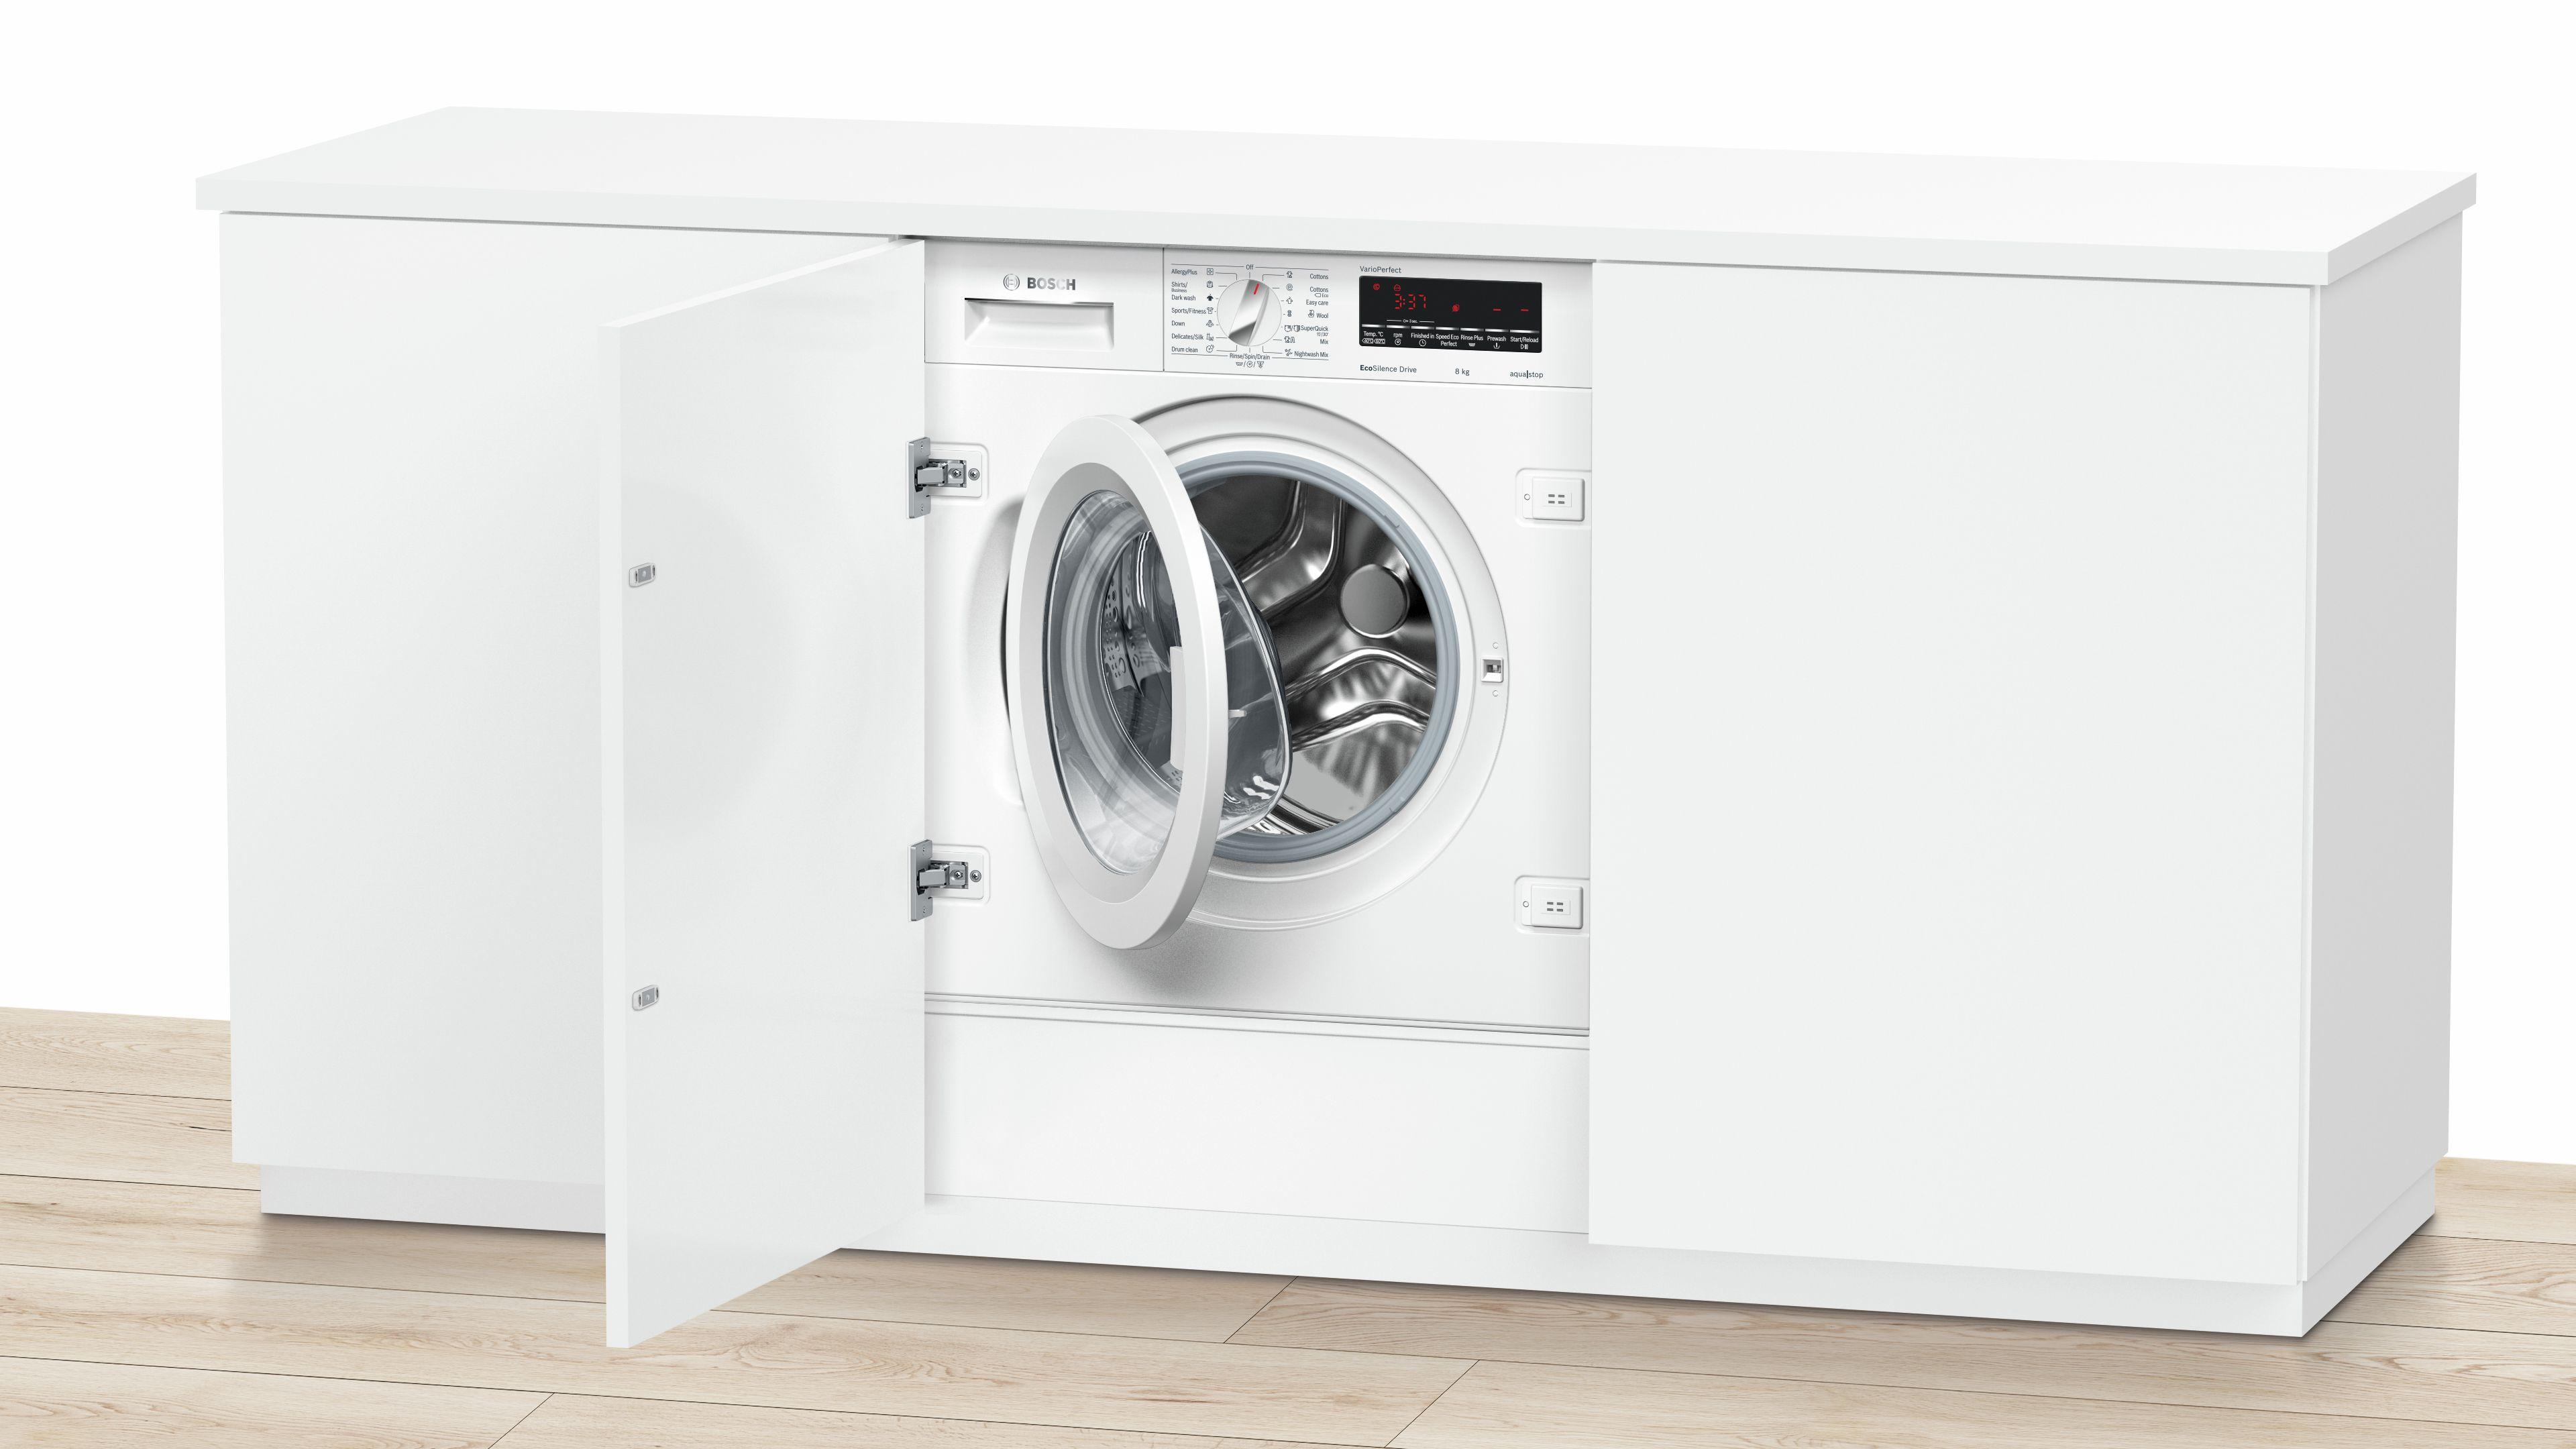 Serie | 8 Mašina za pranje veša, ugradna